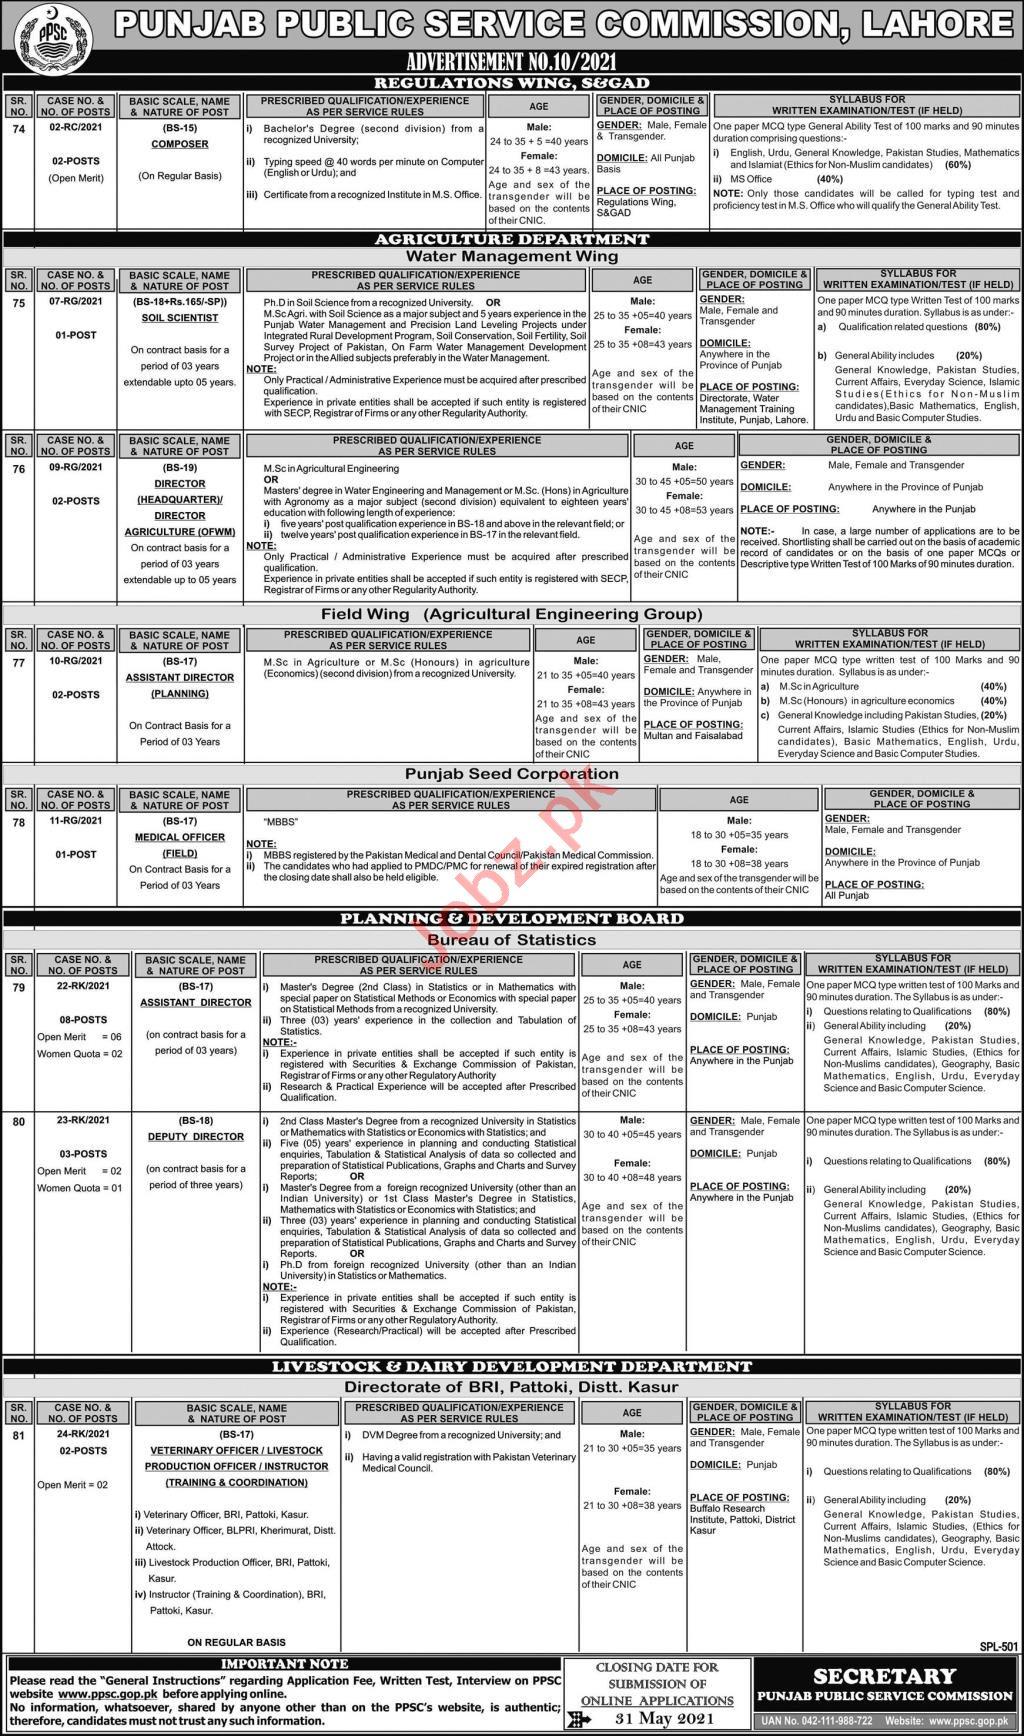 PPSC Advertisement No 10 Jobs May 2021 Jobs 2021